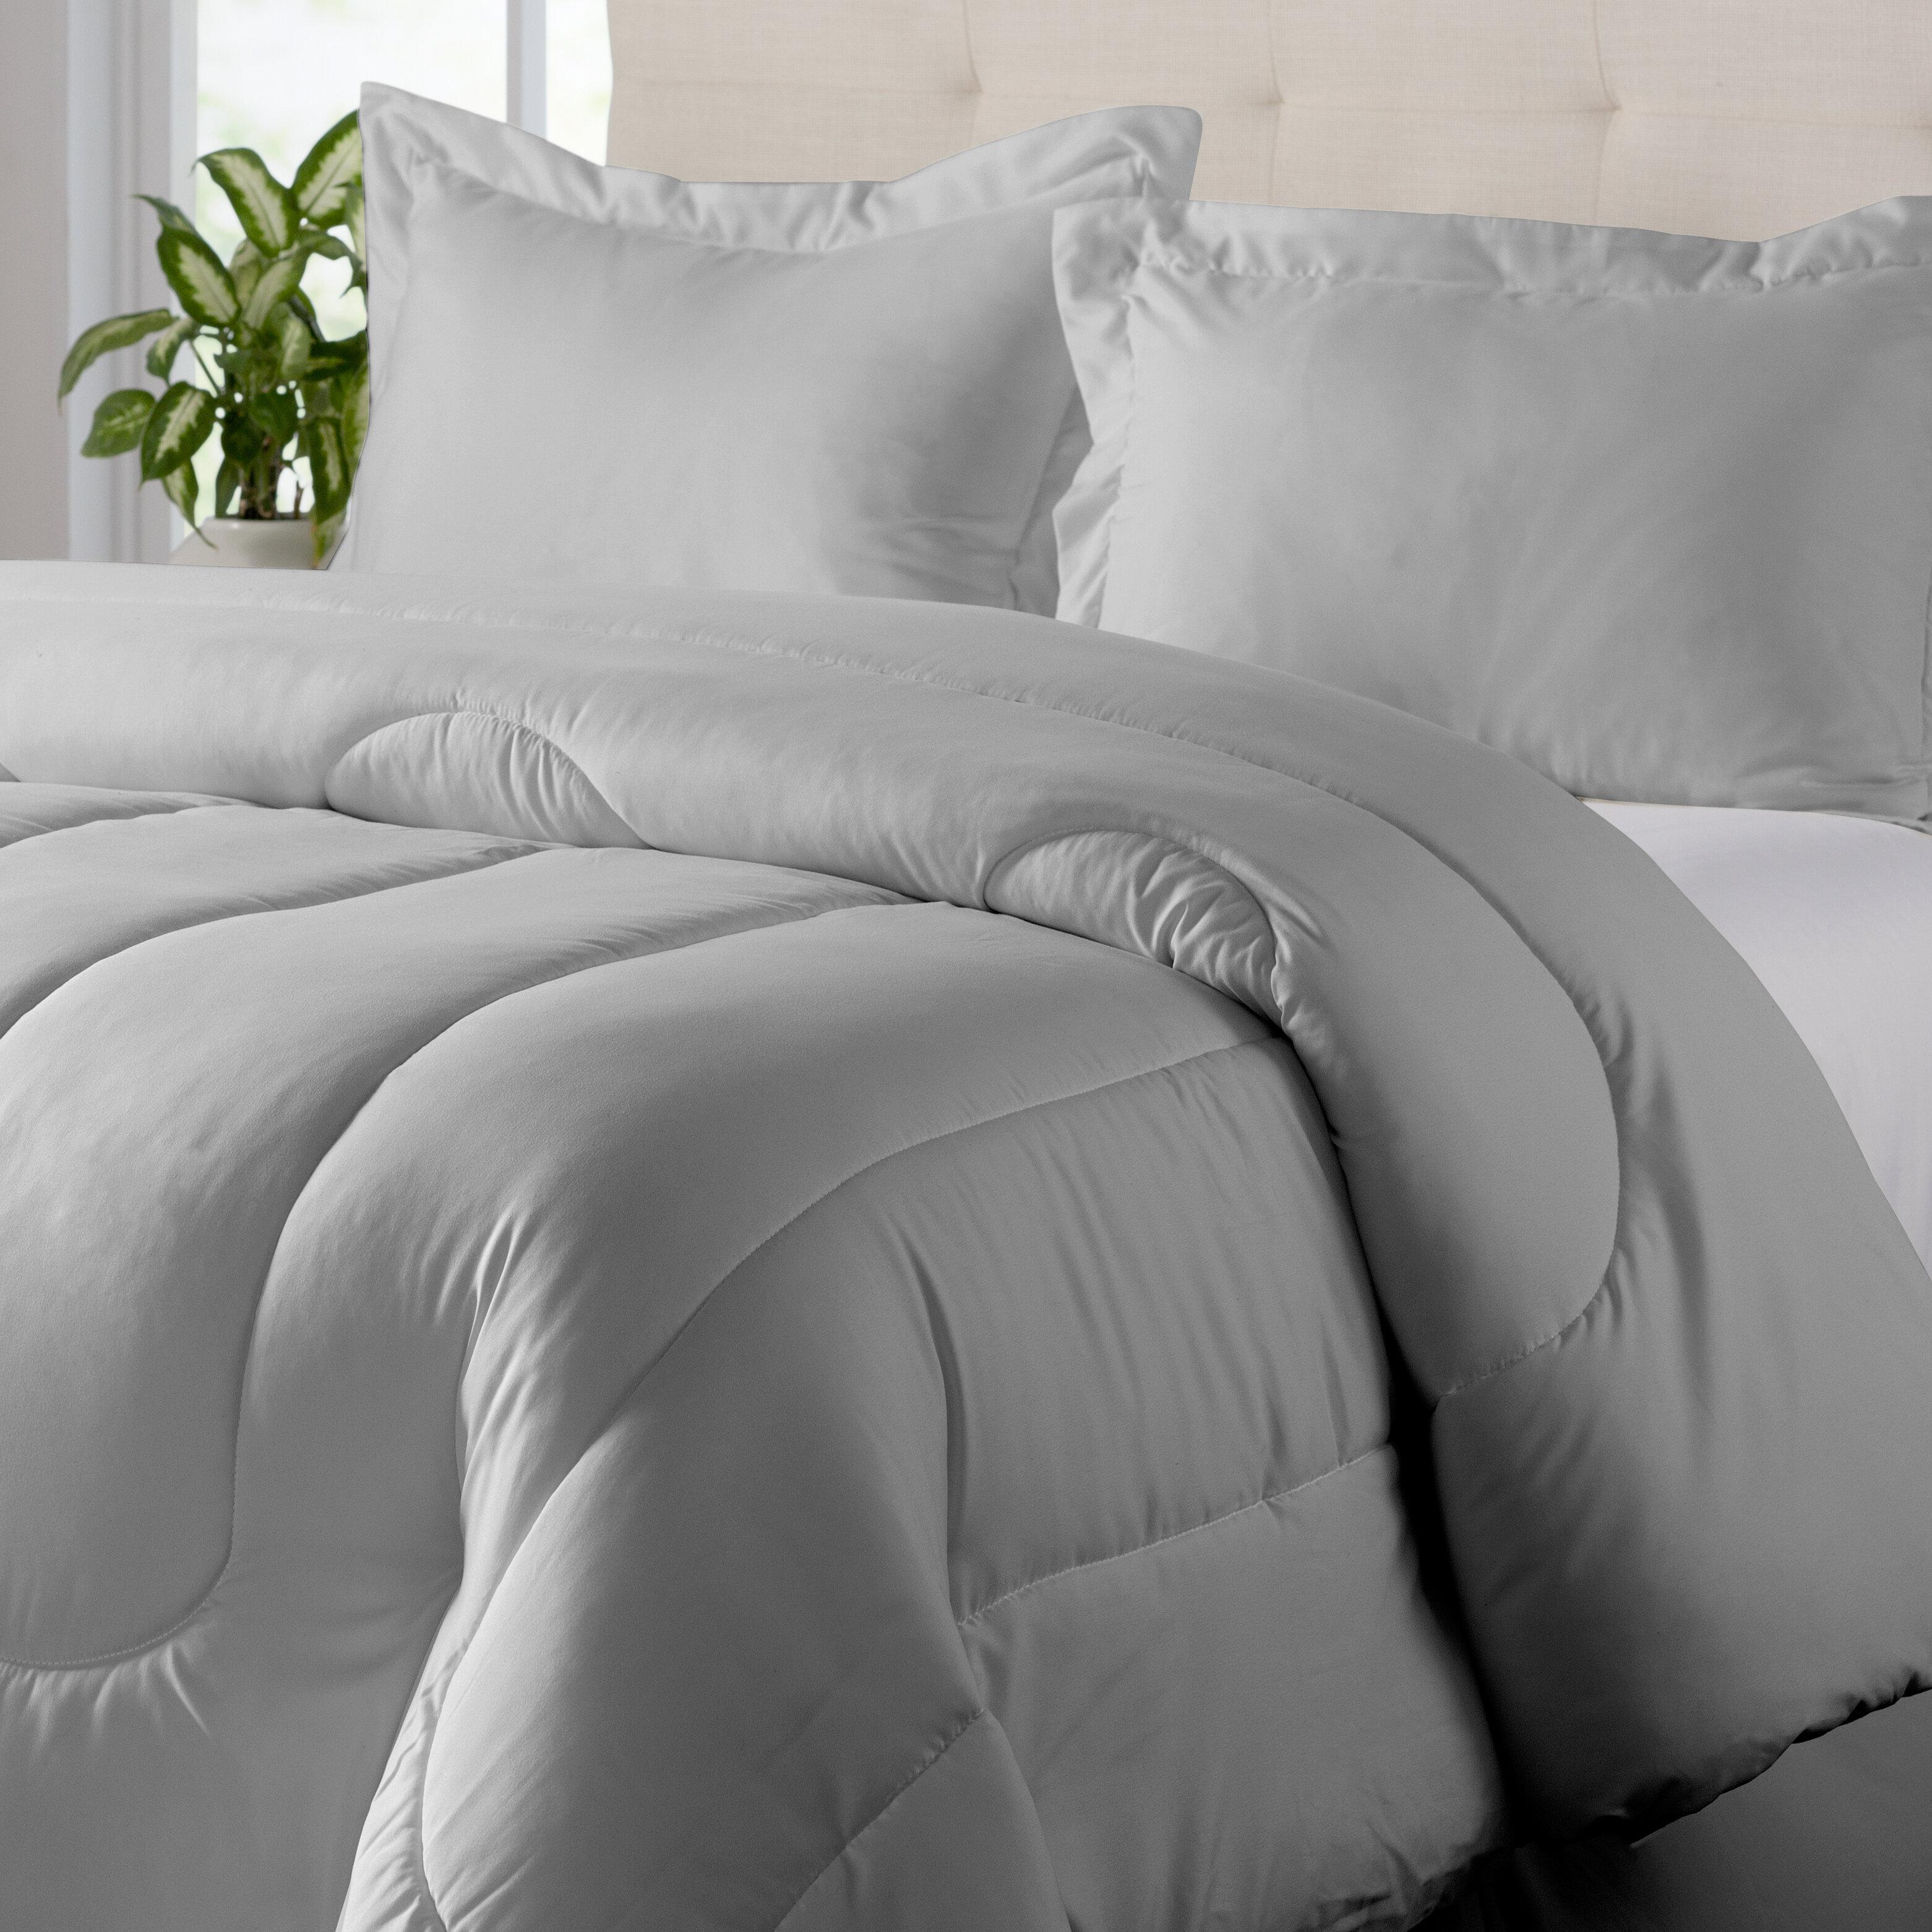 Wayfair Basics Comforter Set